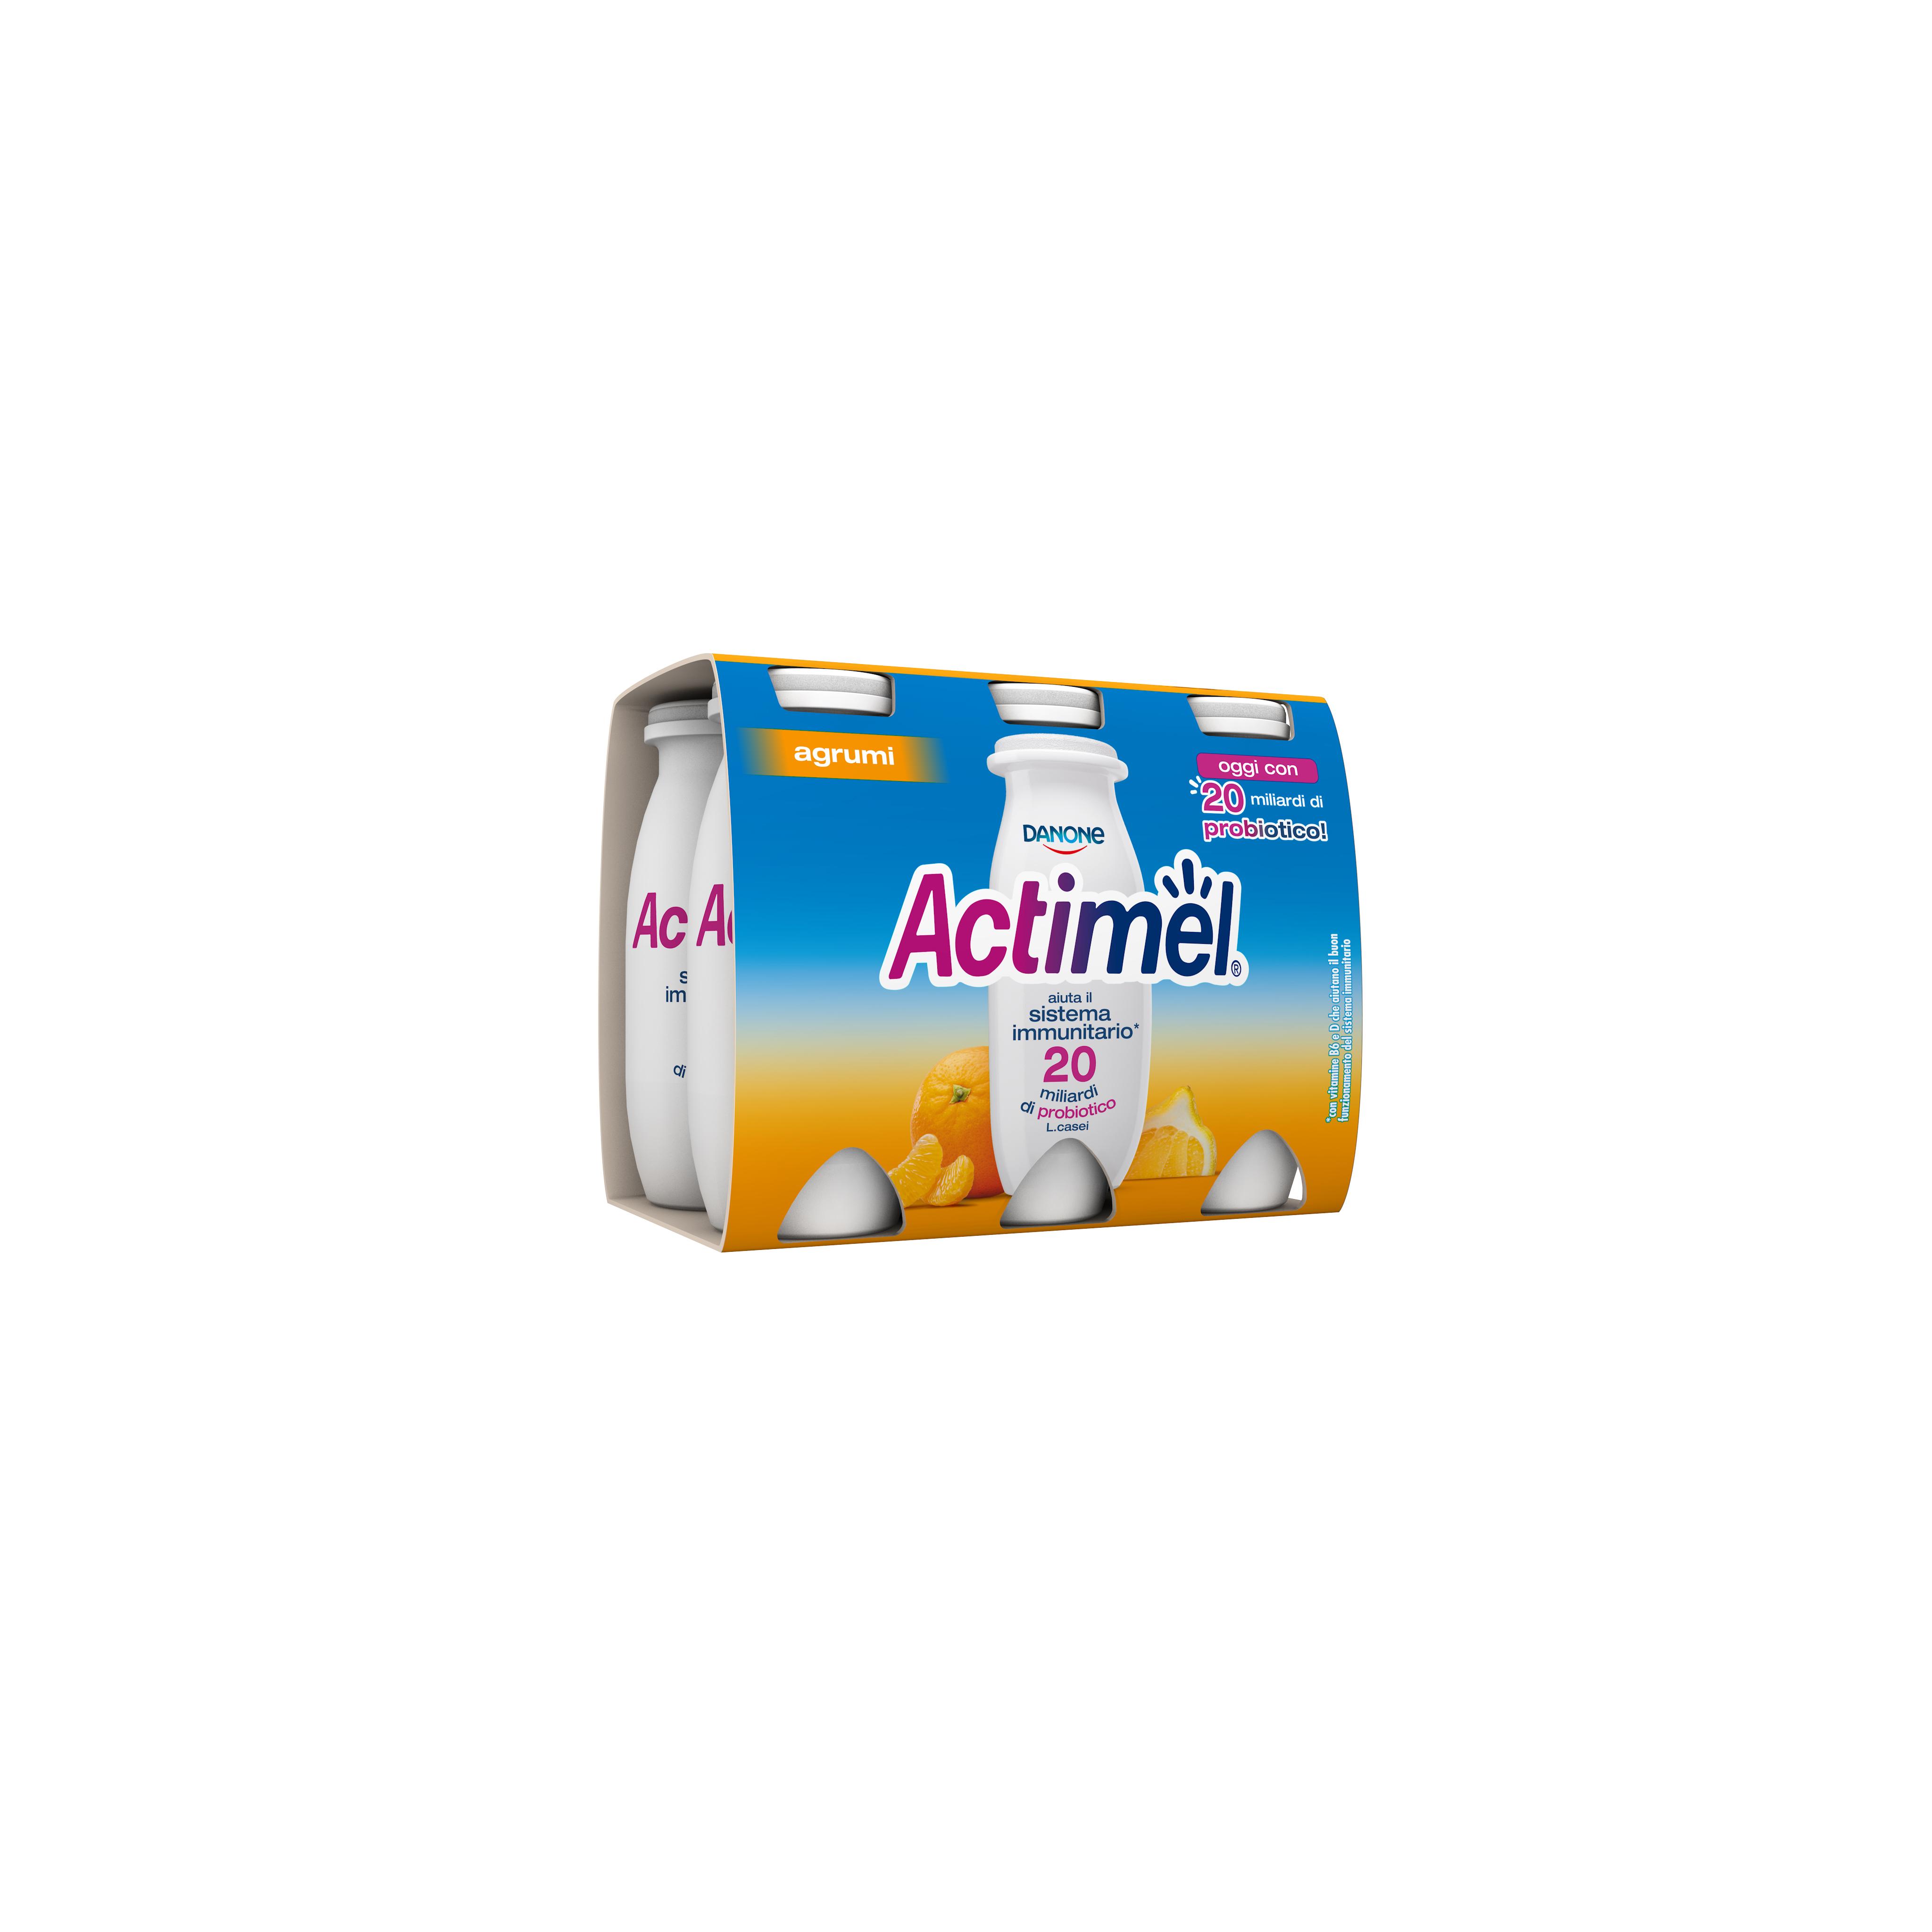 ACTIMEL DANONE 100GX6 AGRUMI